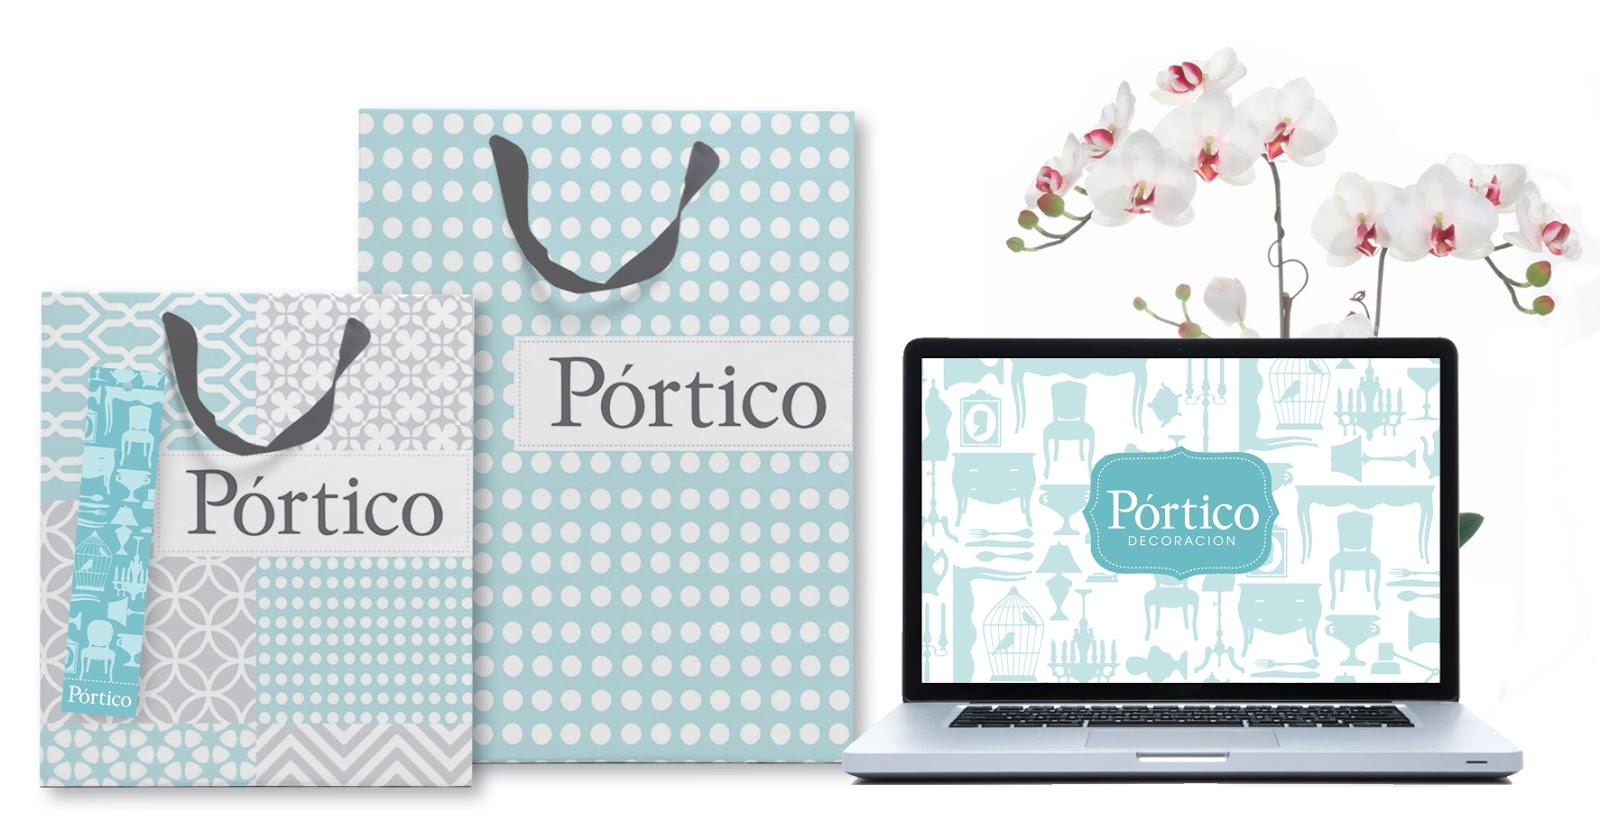 Paula c blog septiembre 2015 - Portico decoracion catalogo ...